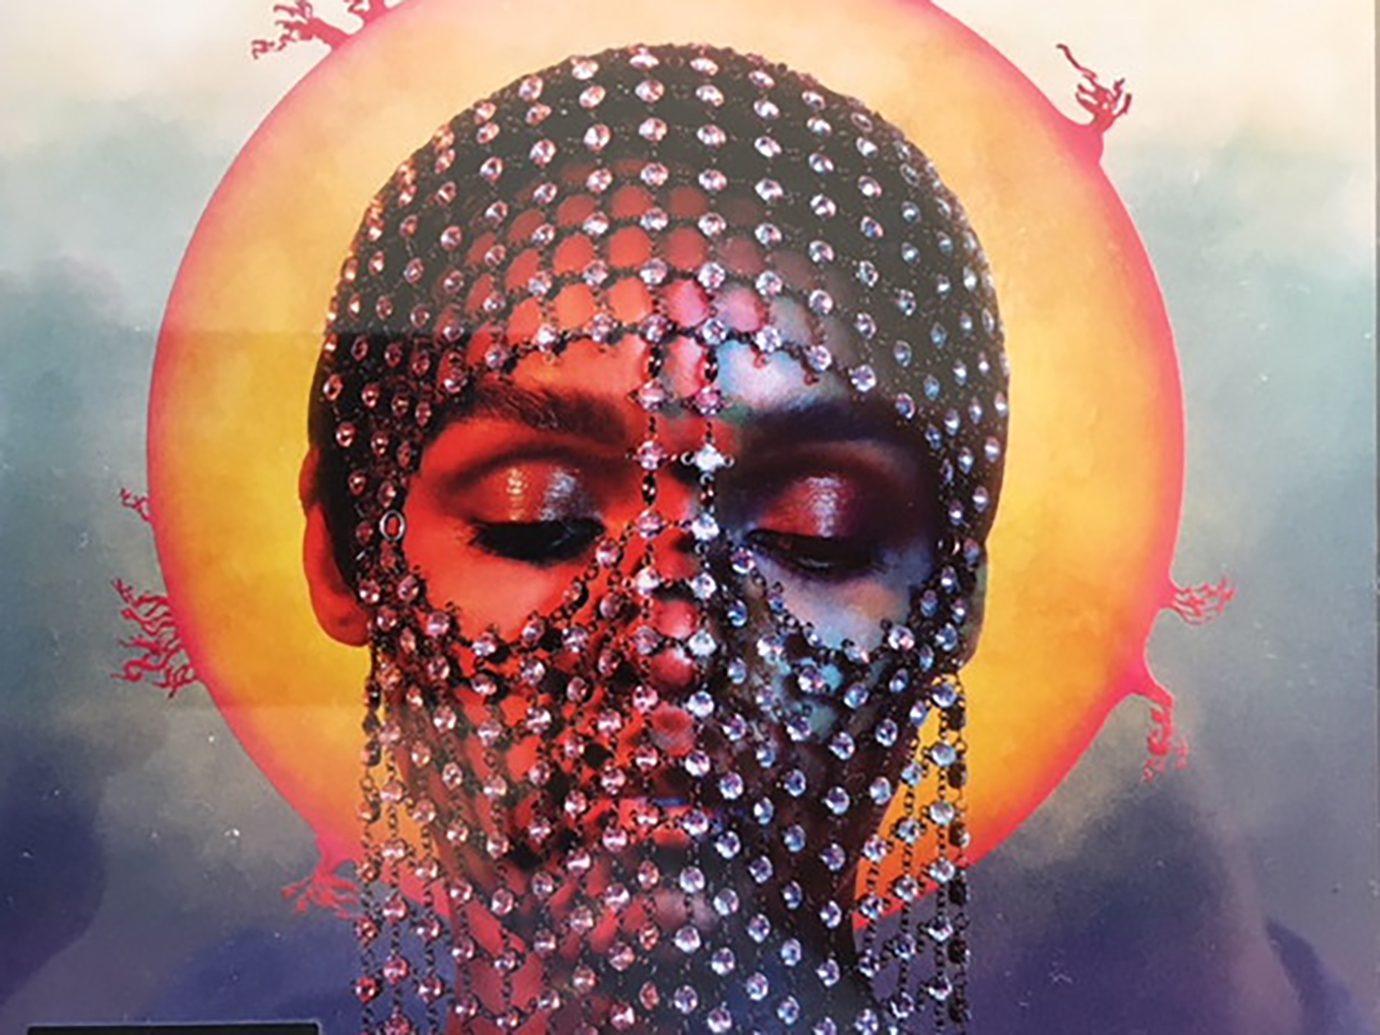 Farinas Album des Jahres: Janelle Monáe – Dirty Computer